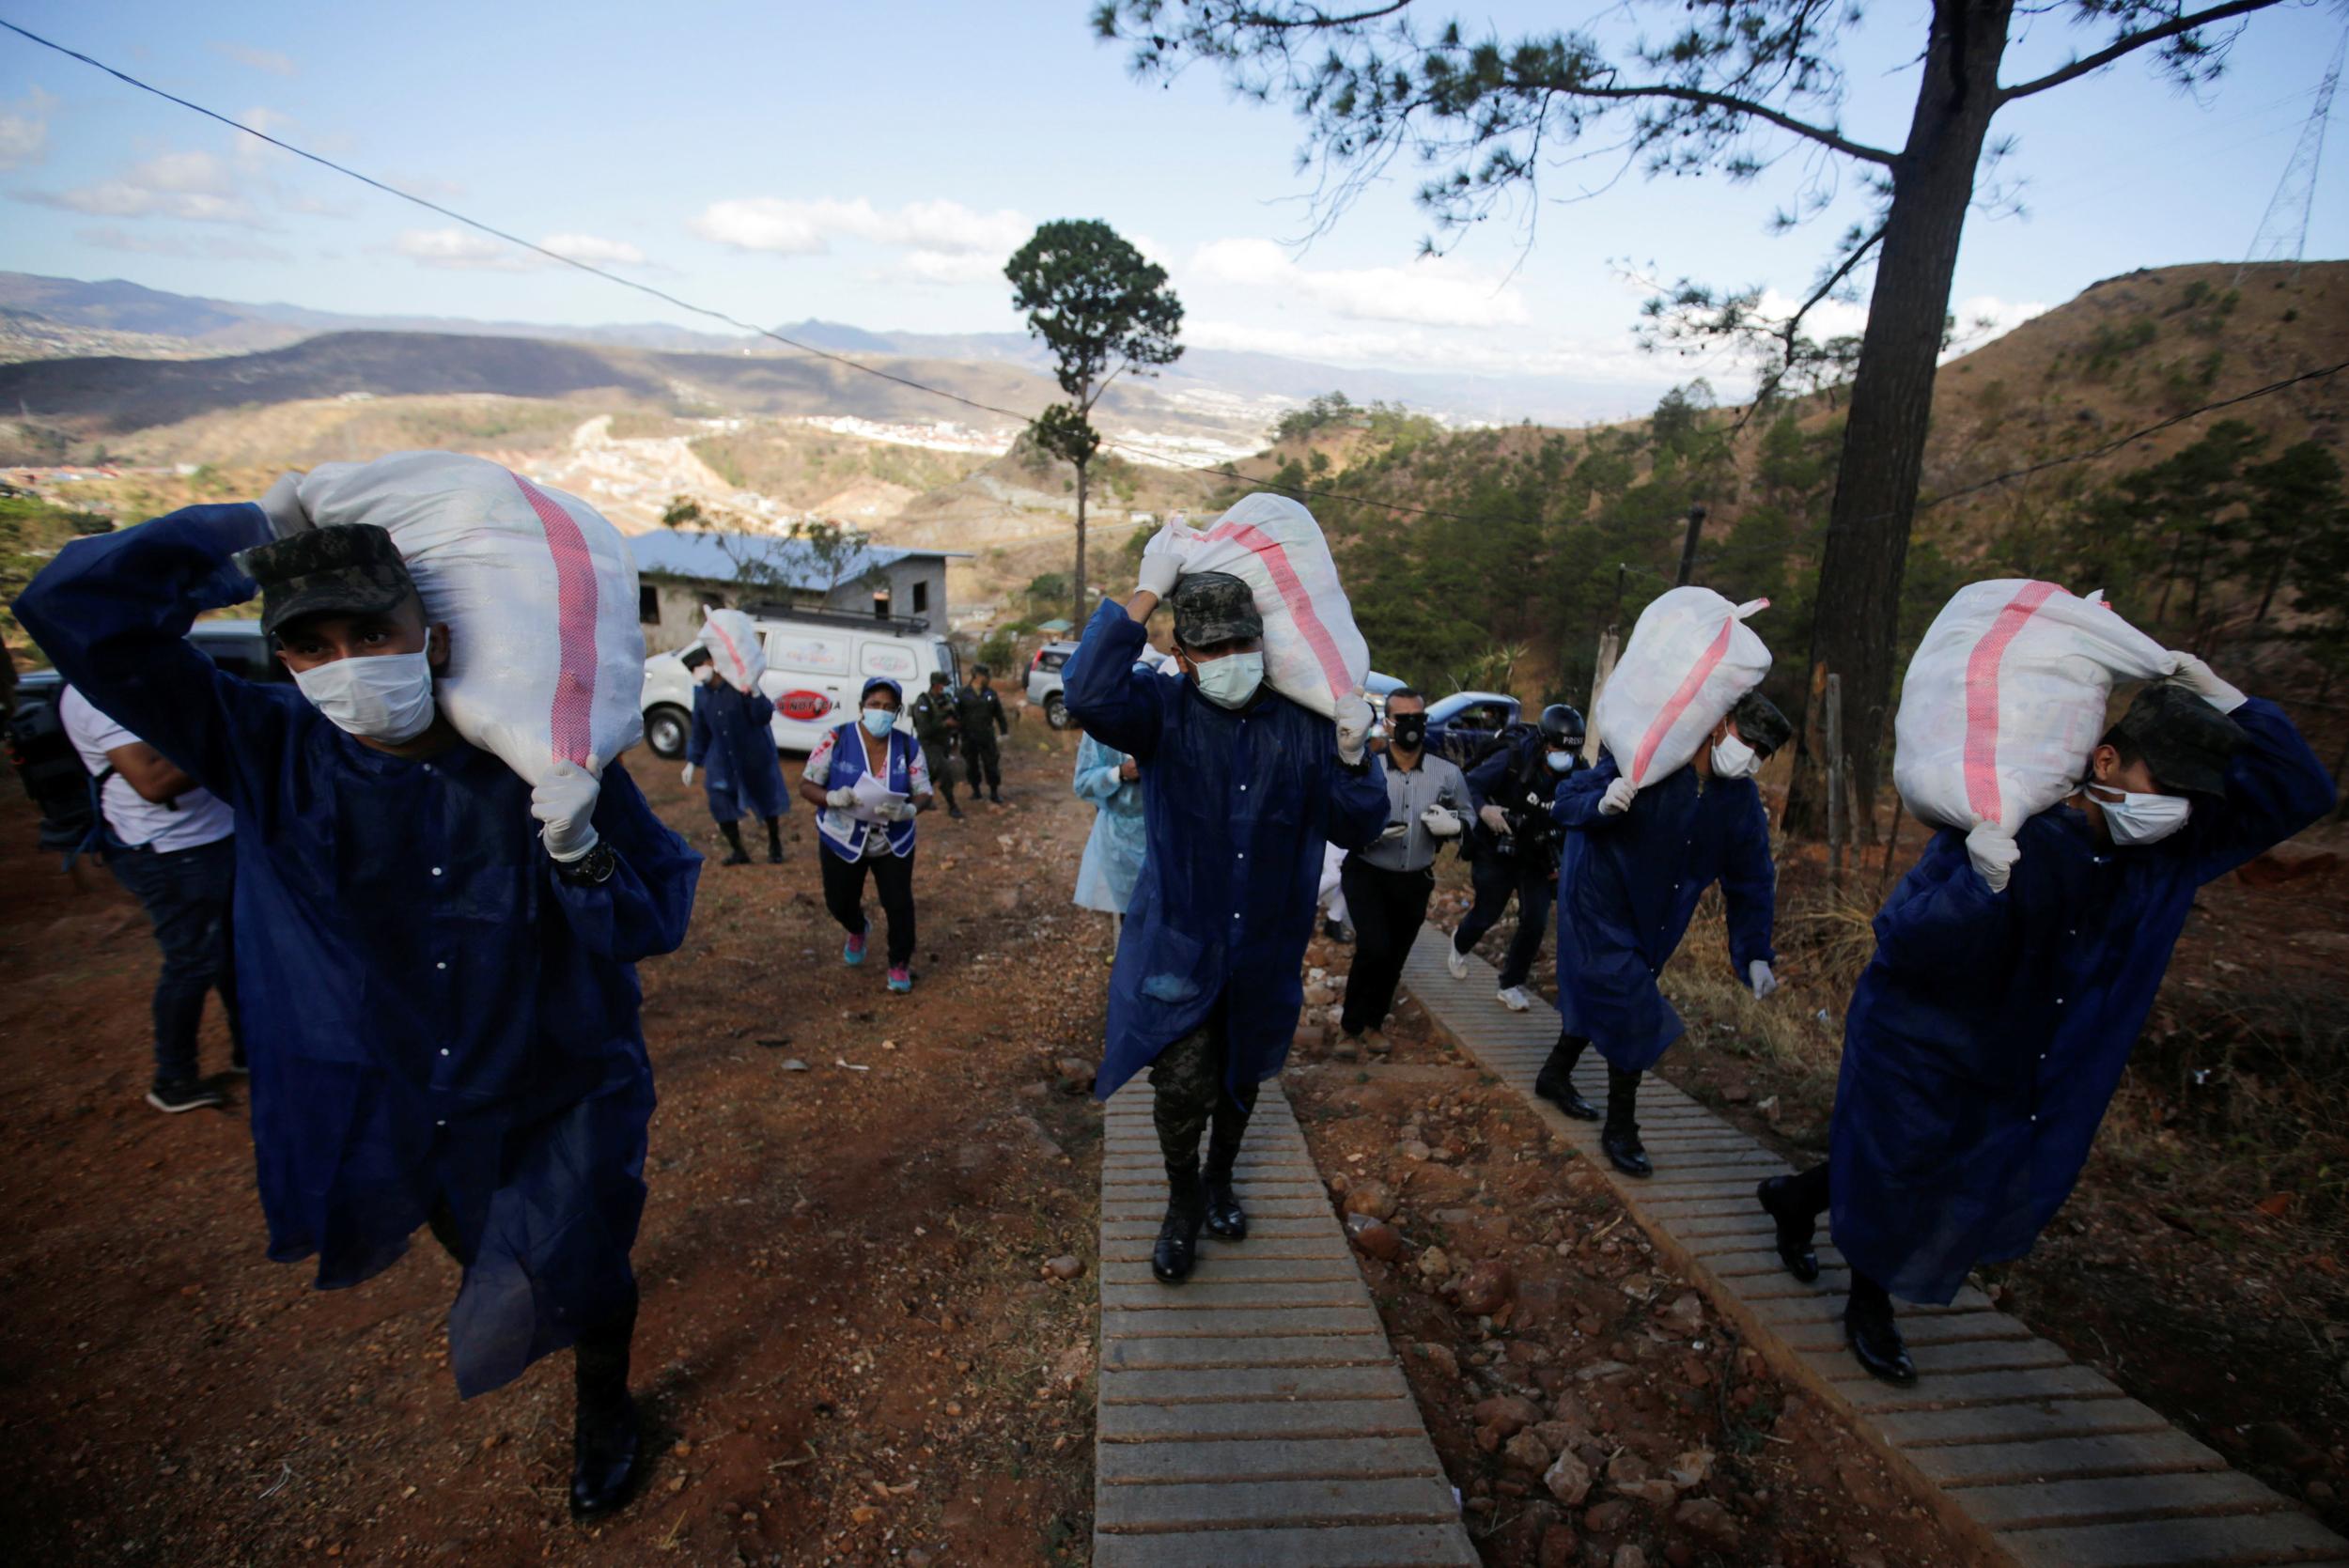 In Honduras, soldiers deliver food to over 3 million in coronavirus lockdown